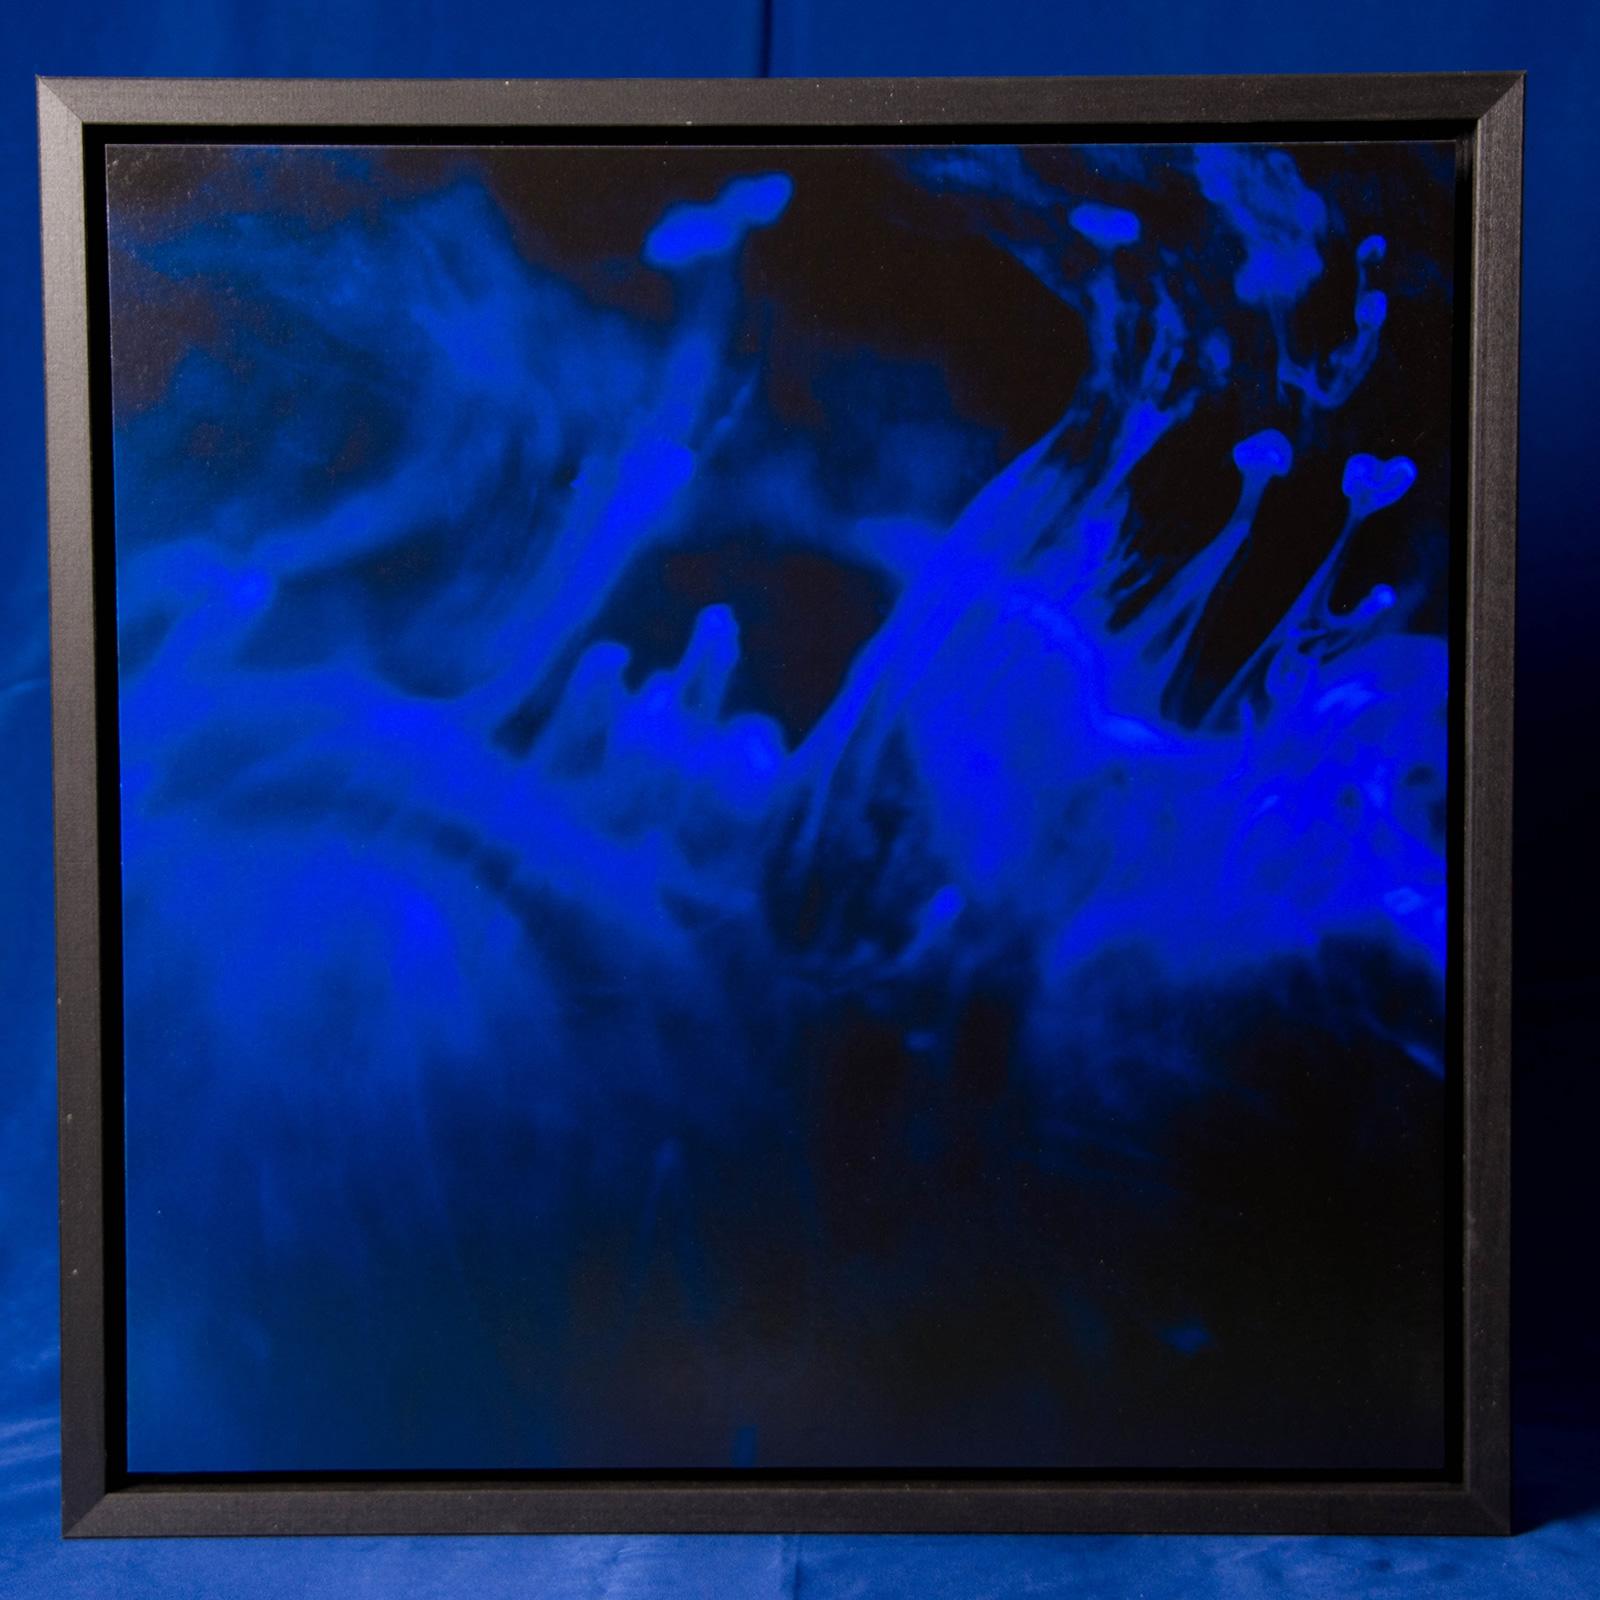 microcosmic visions #2 40x40 cm ca.